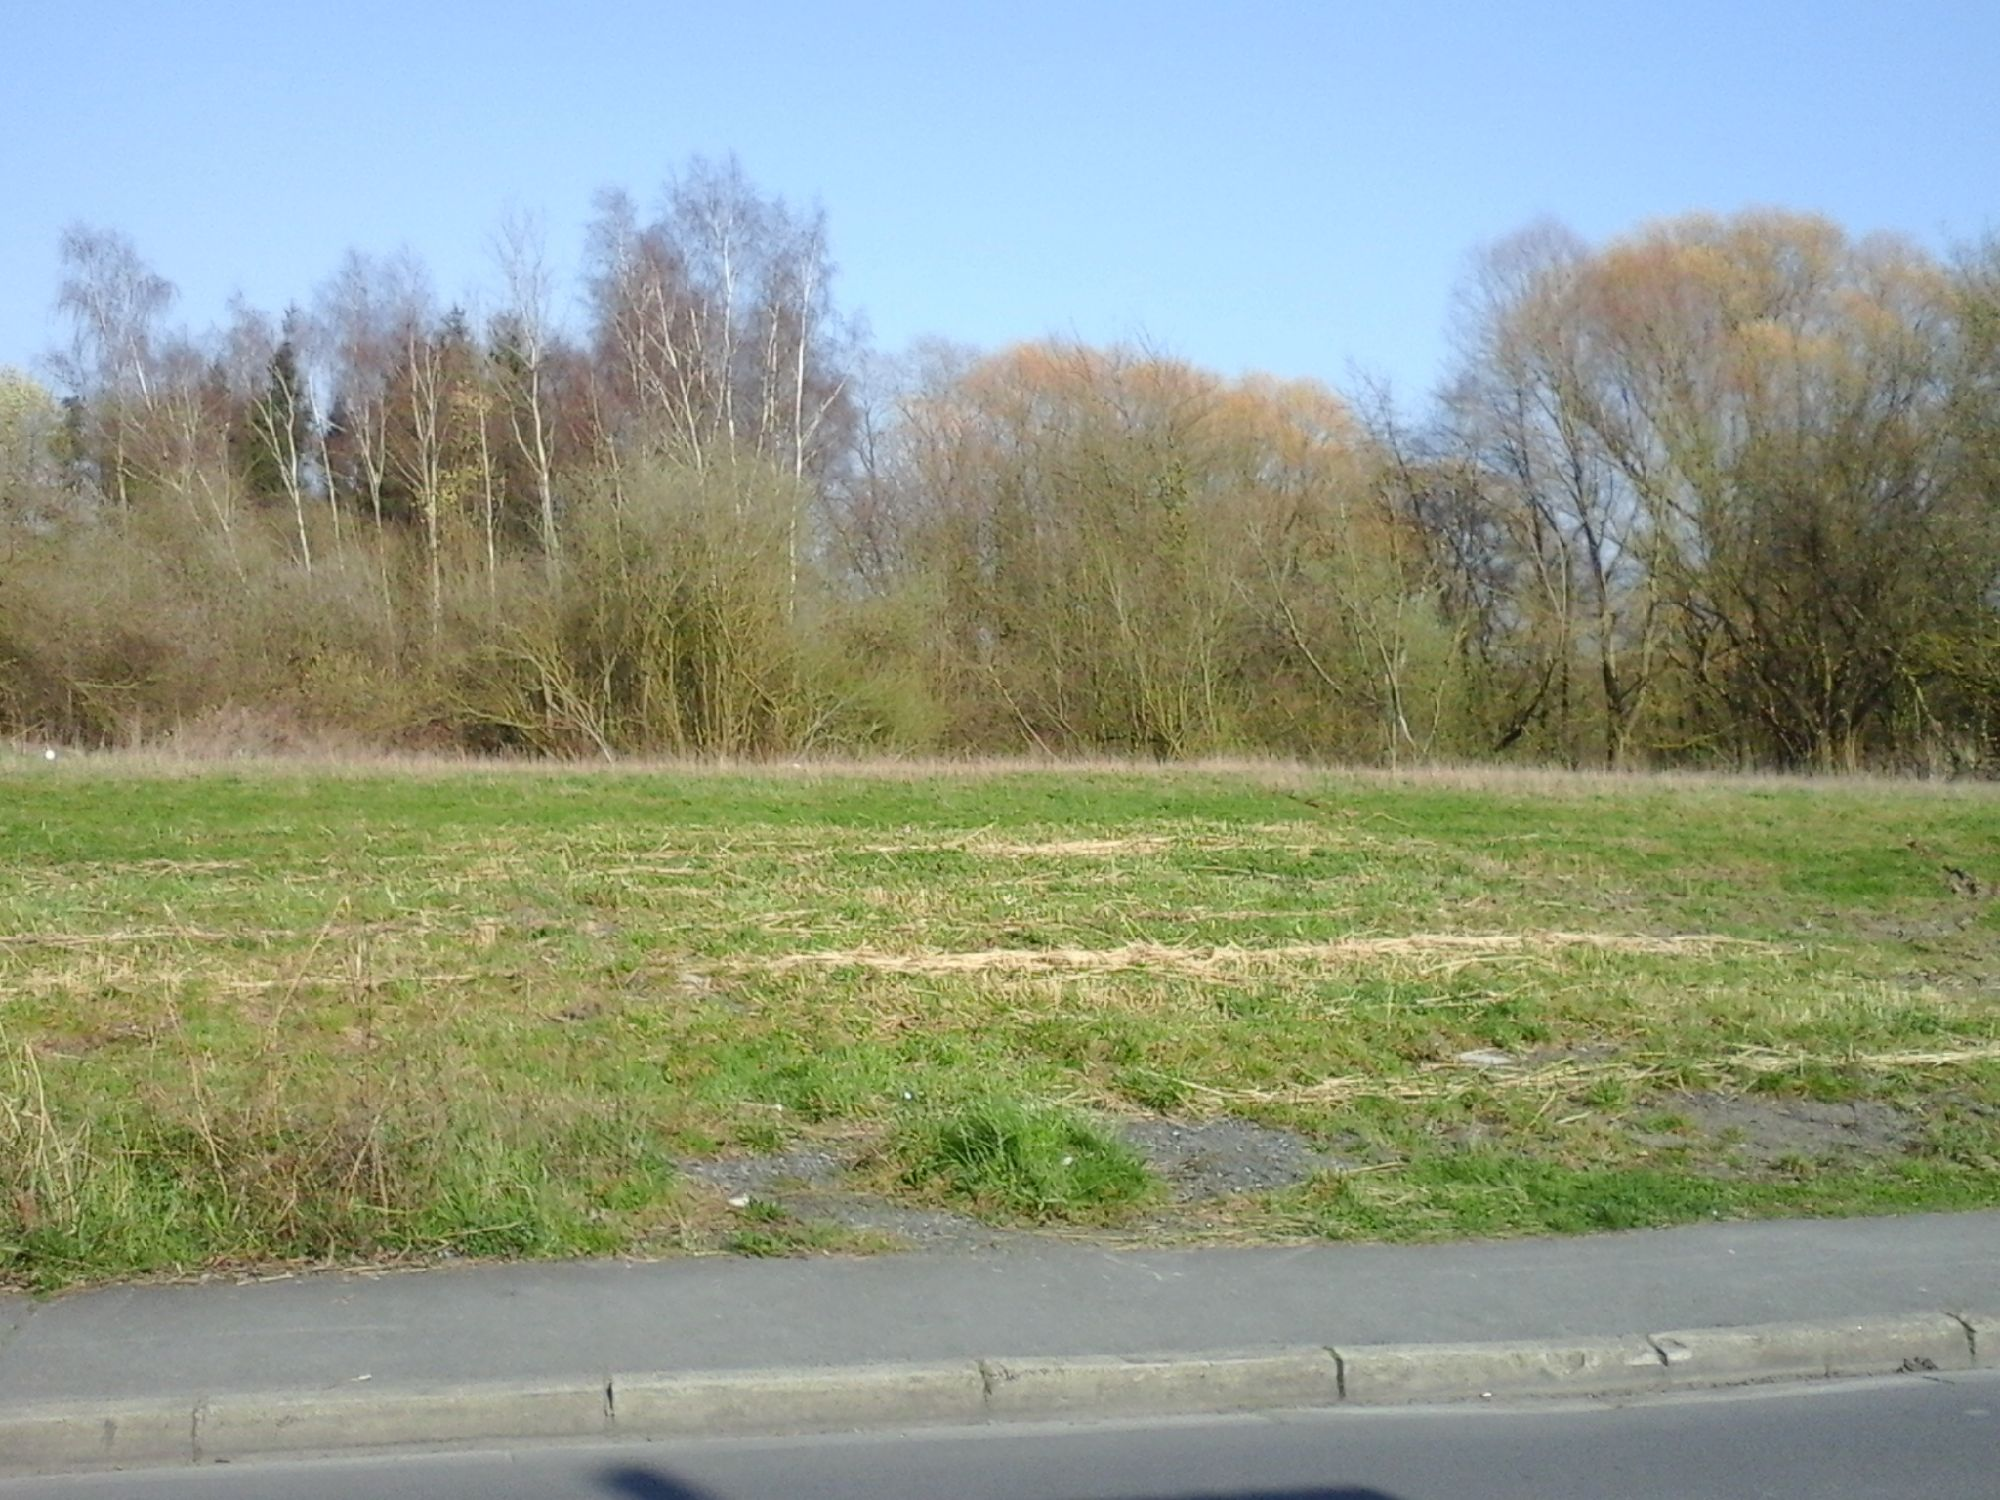 Vente terrain a batir raismes prix 41 500 hni ref for Terrain prix